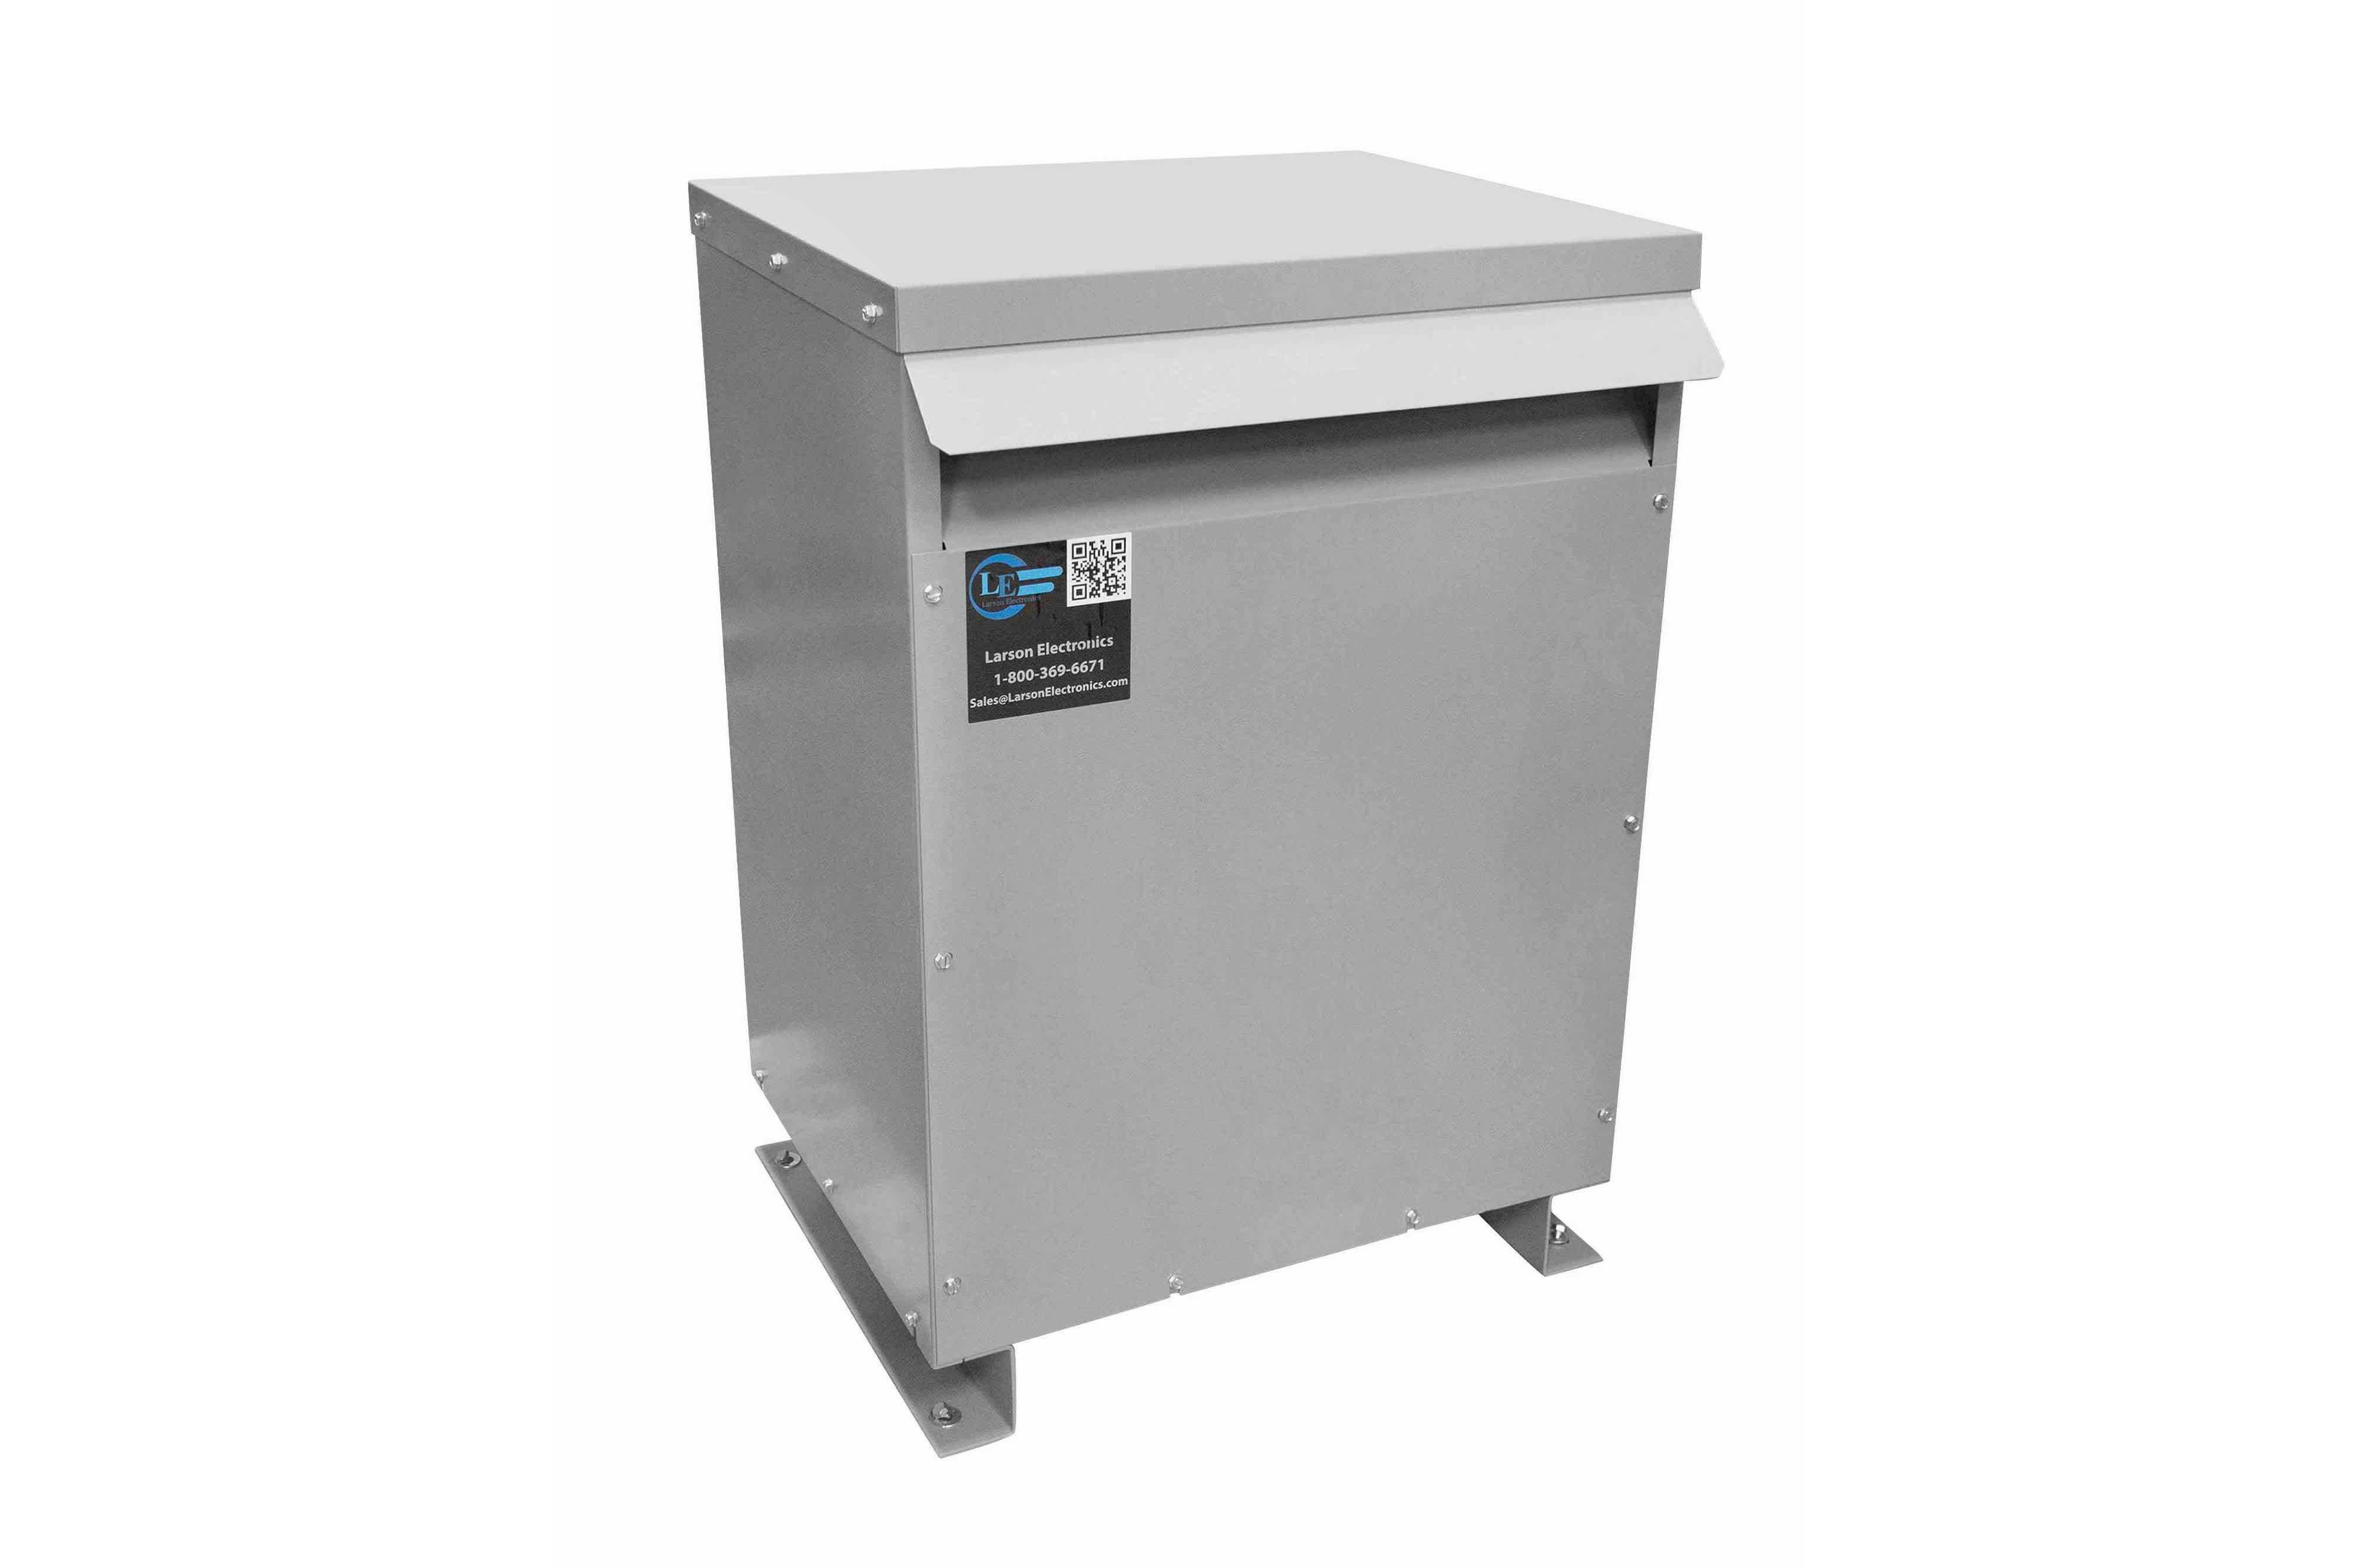 12 kVA 3PH DOE Transformer, 208V Delta Primary, 415Y/240 Wye-N Secondary, N3R, Ventilated, 60 Hz